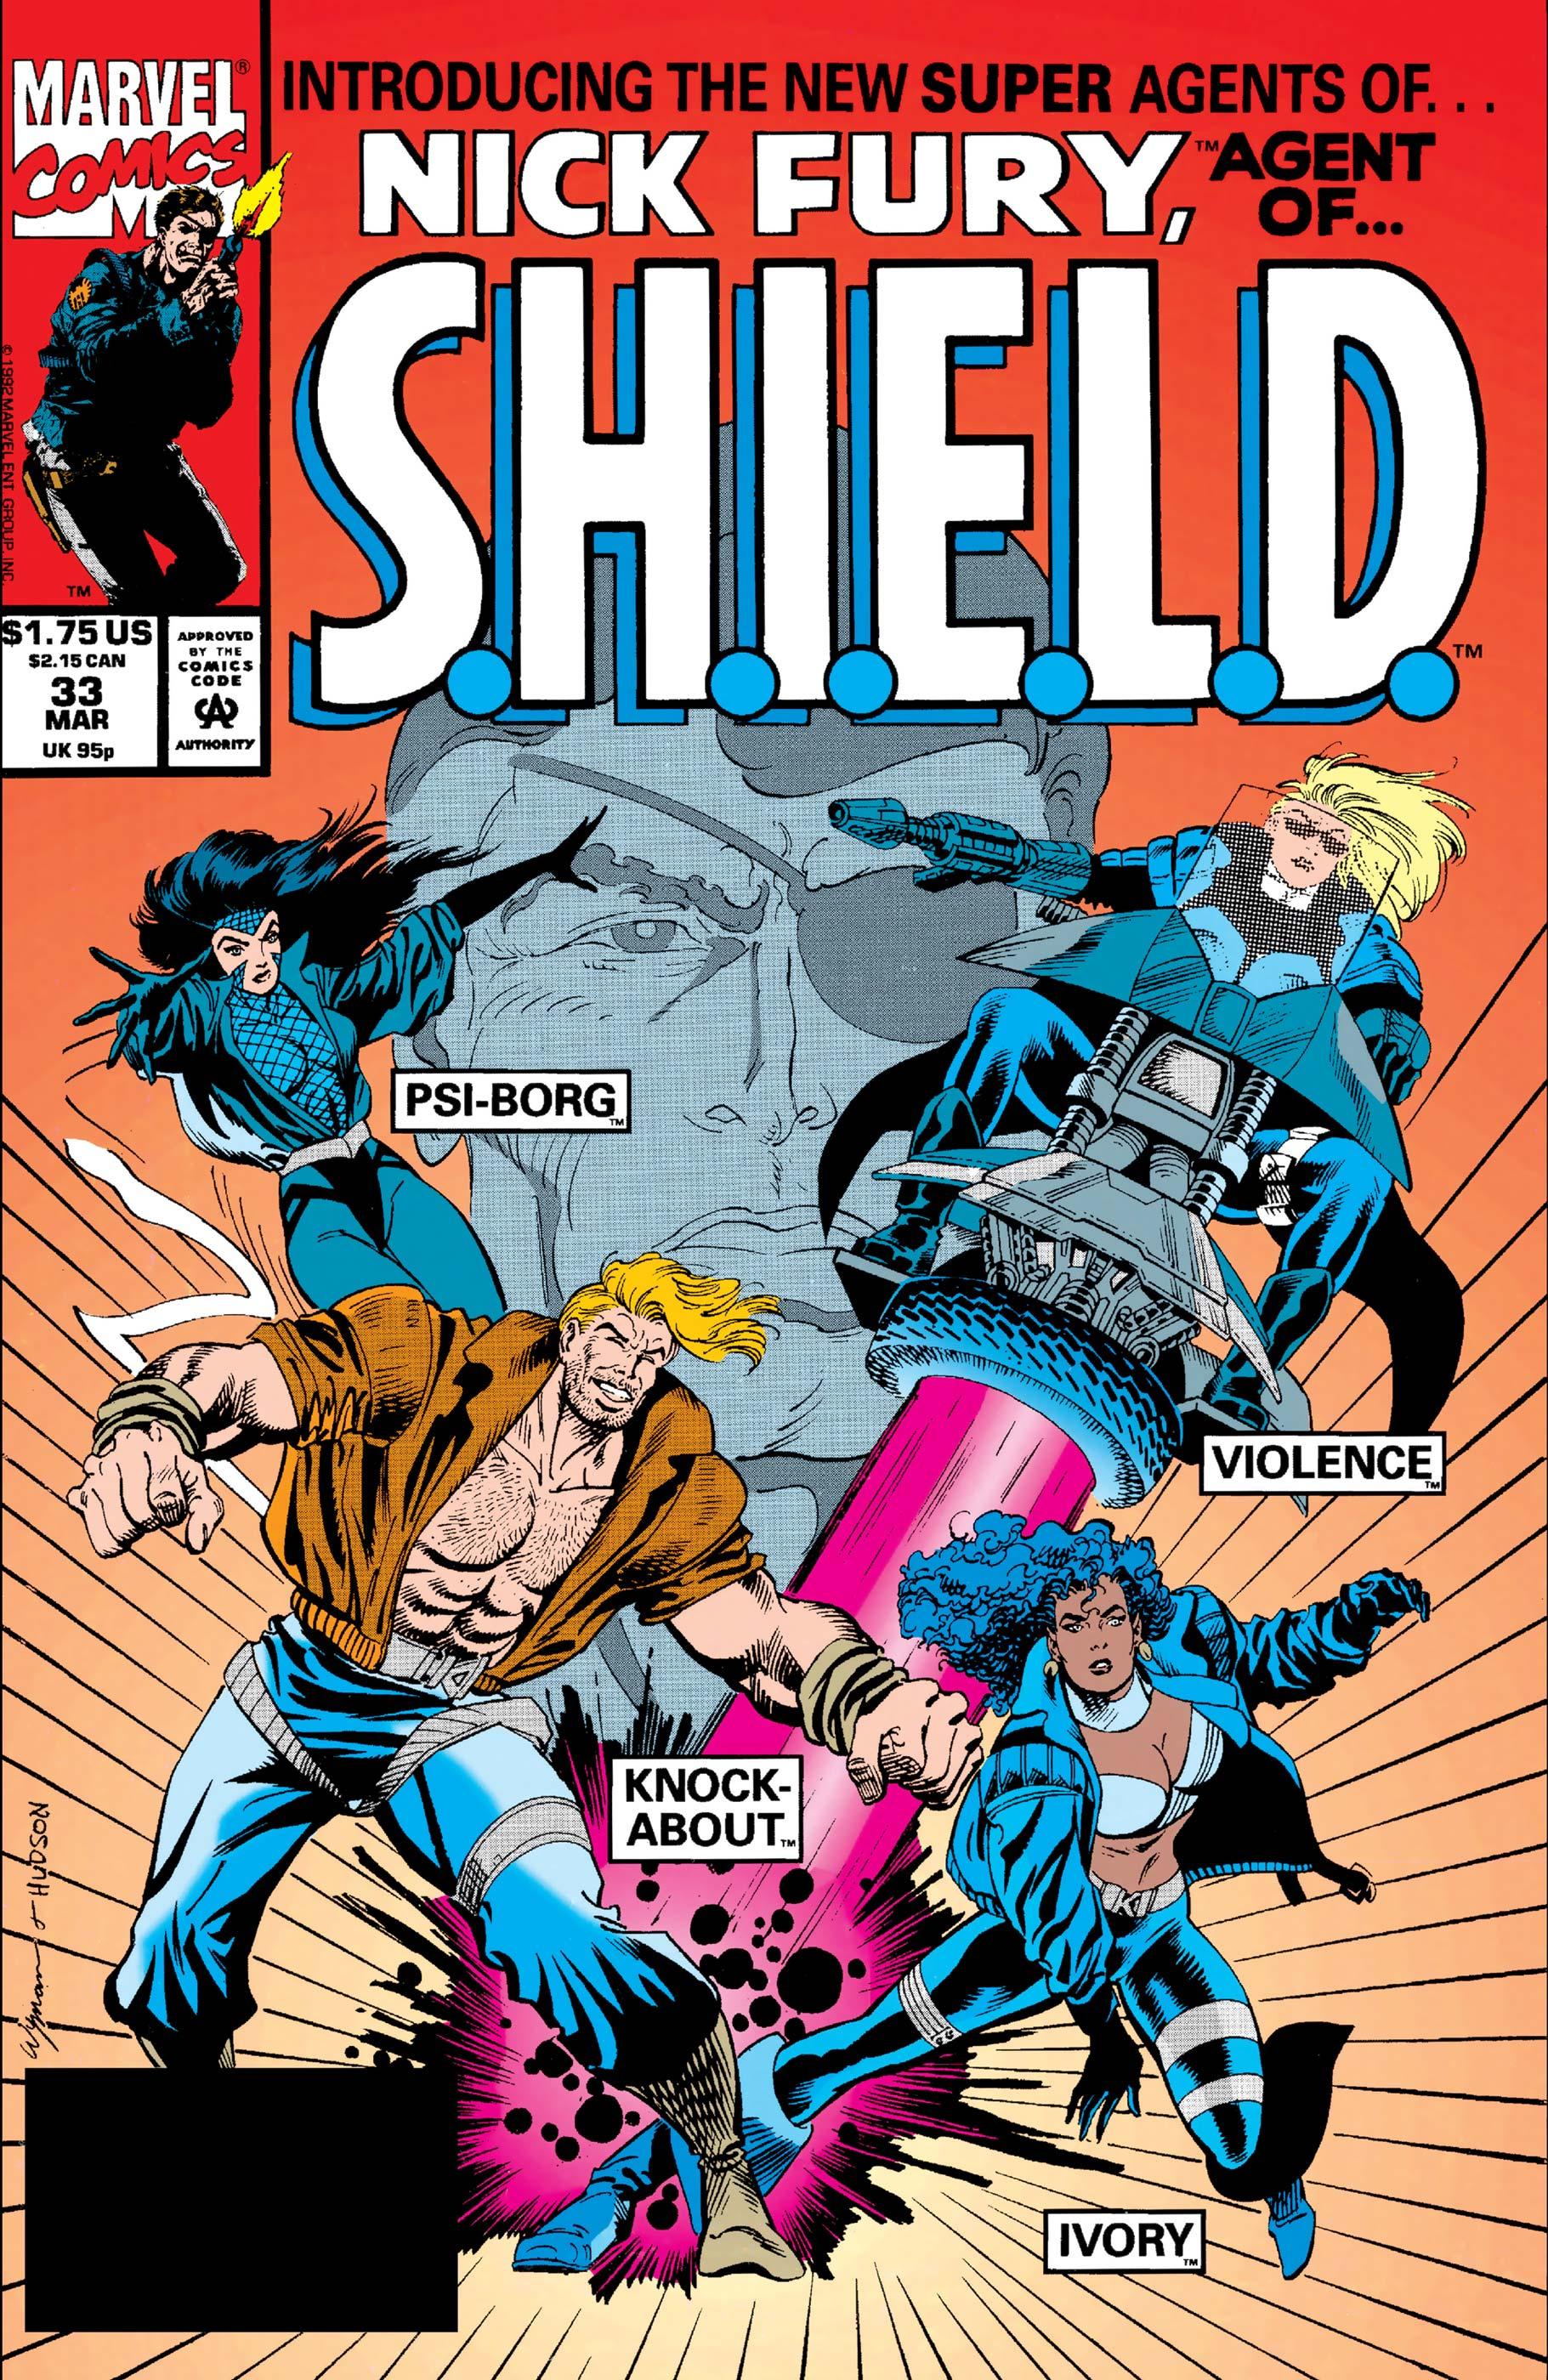 Nick Fury, Agent of S.H.I.E.L.D. (1989) #33